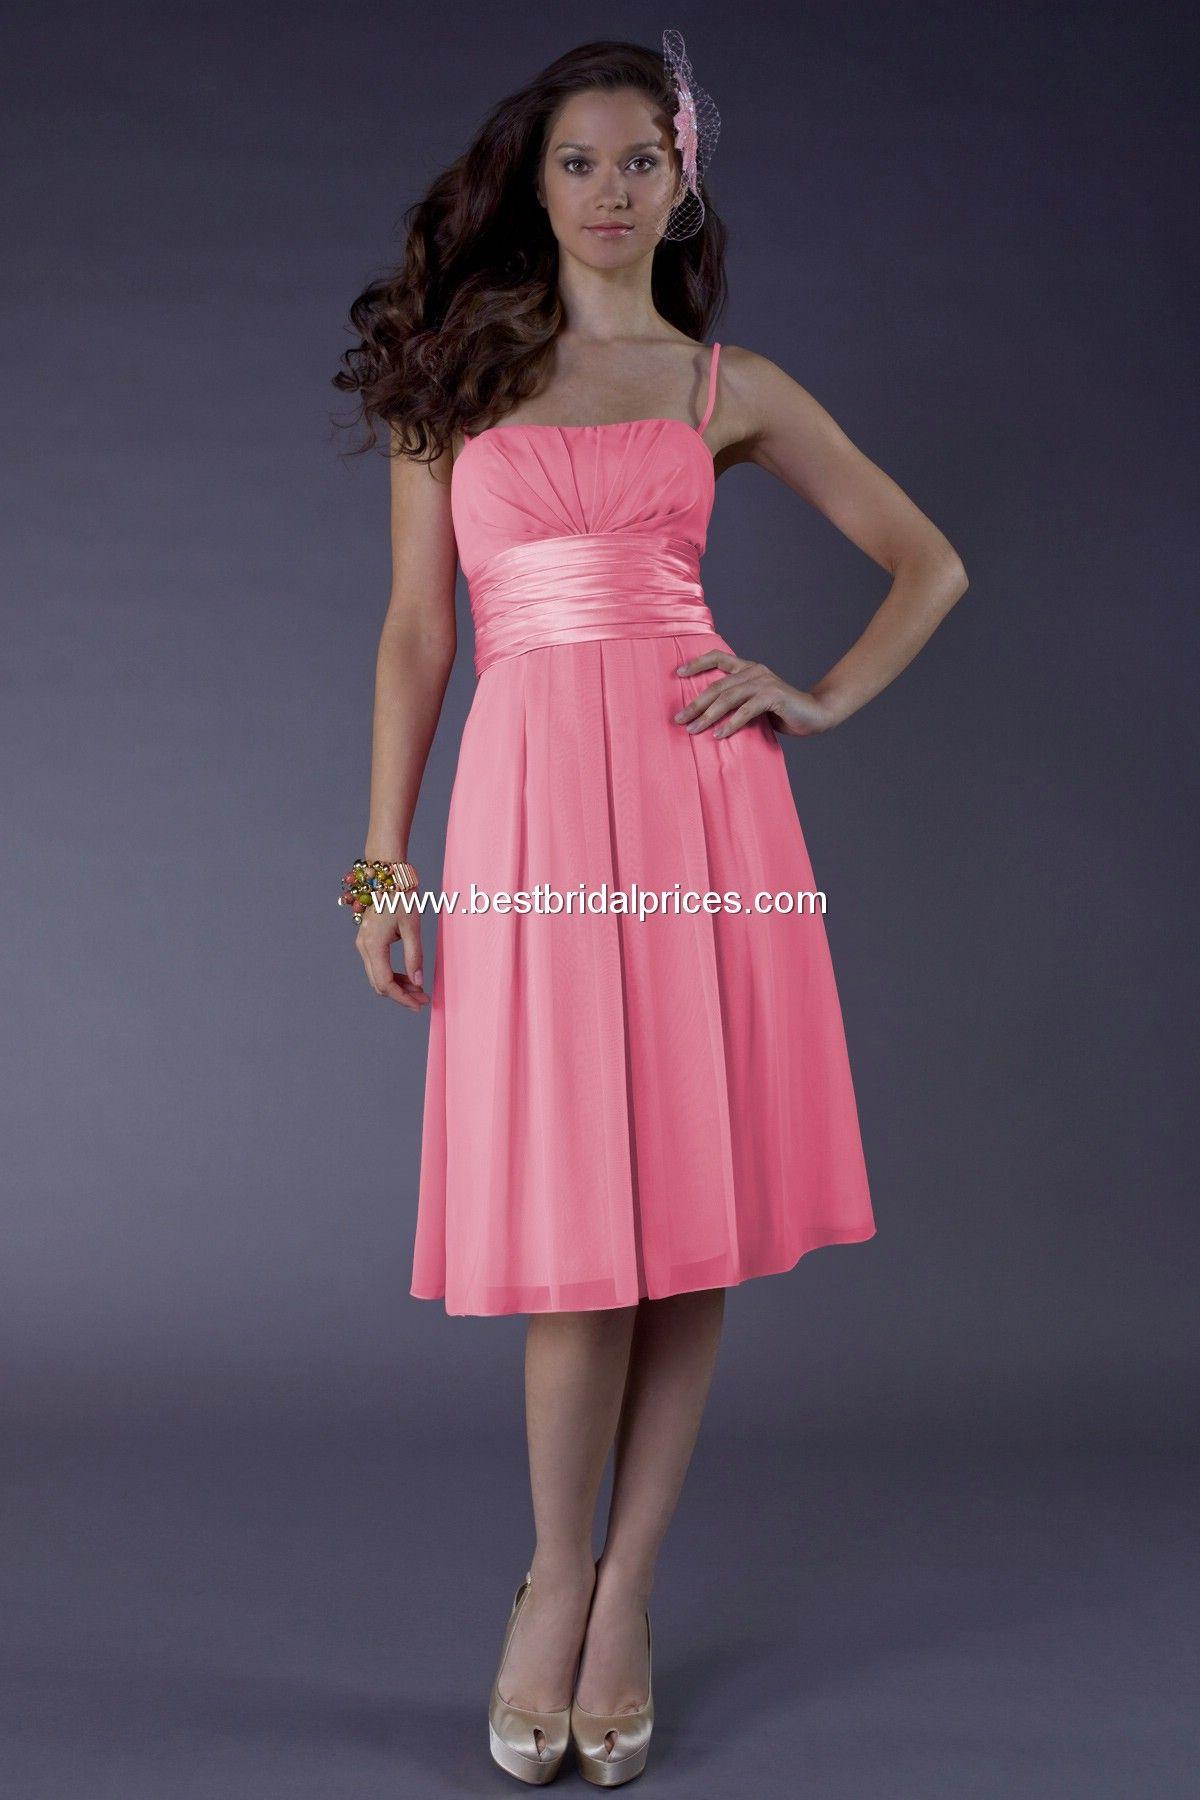 liz fields designer bridesmaid dresses http://www.lizfields.com ...